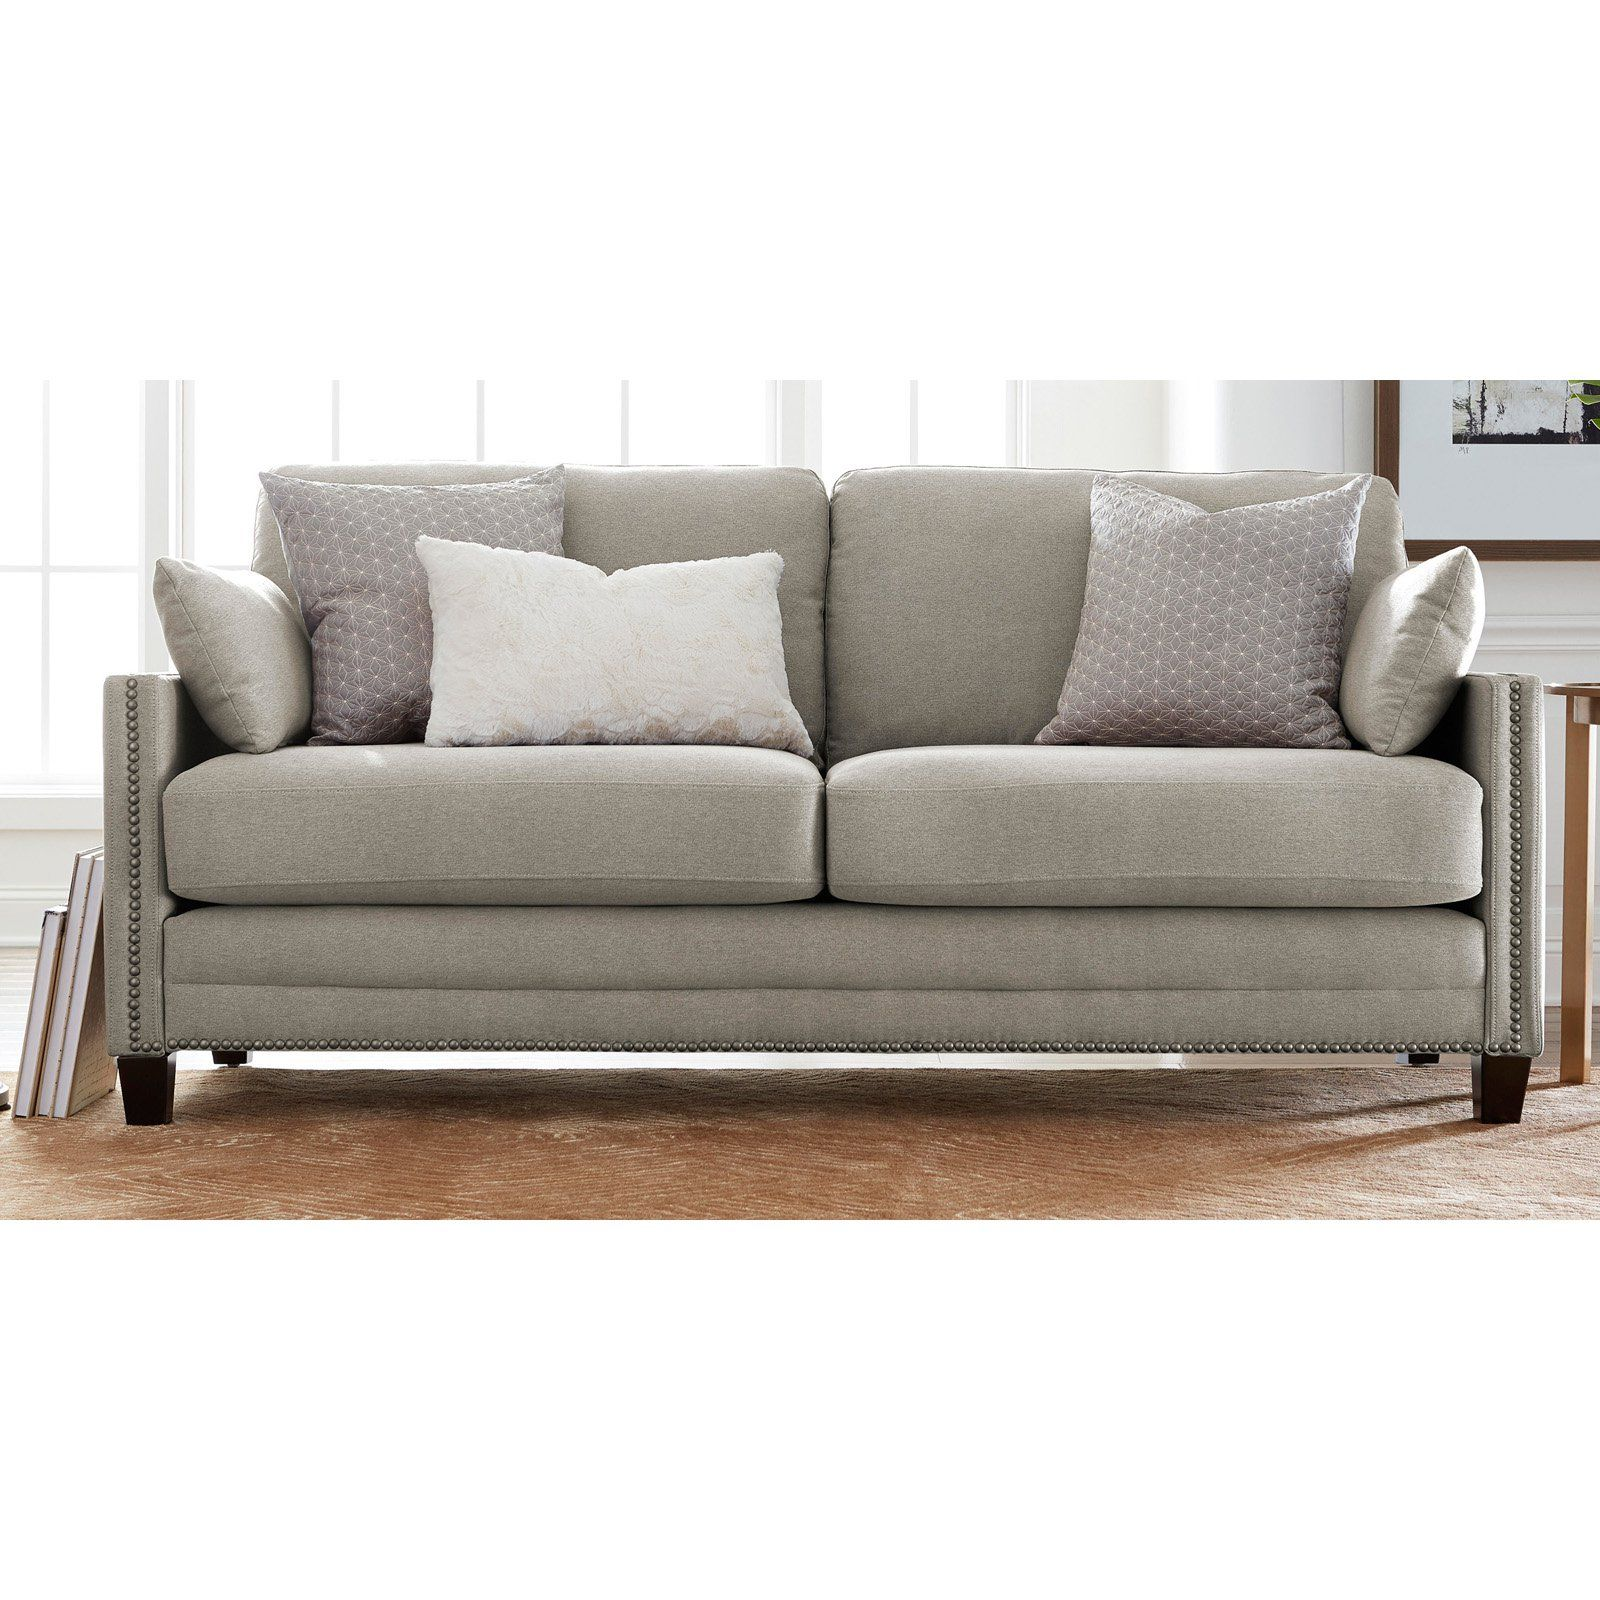 Best Elle Decor Bella Sofa French Gray In 2020 Elle Decor 640 x 480